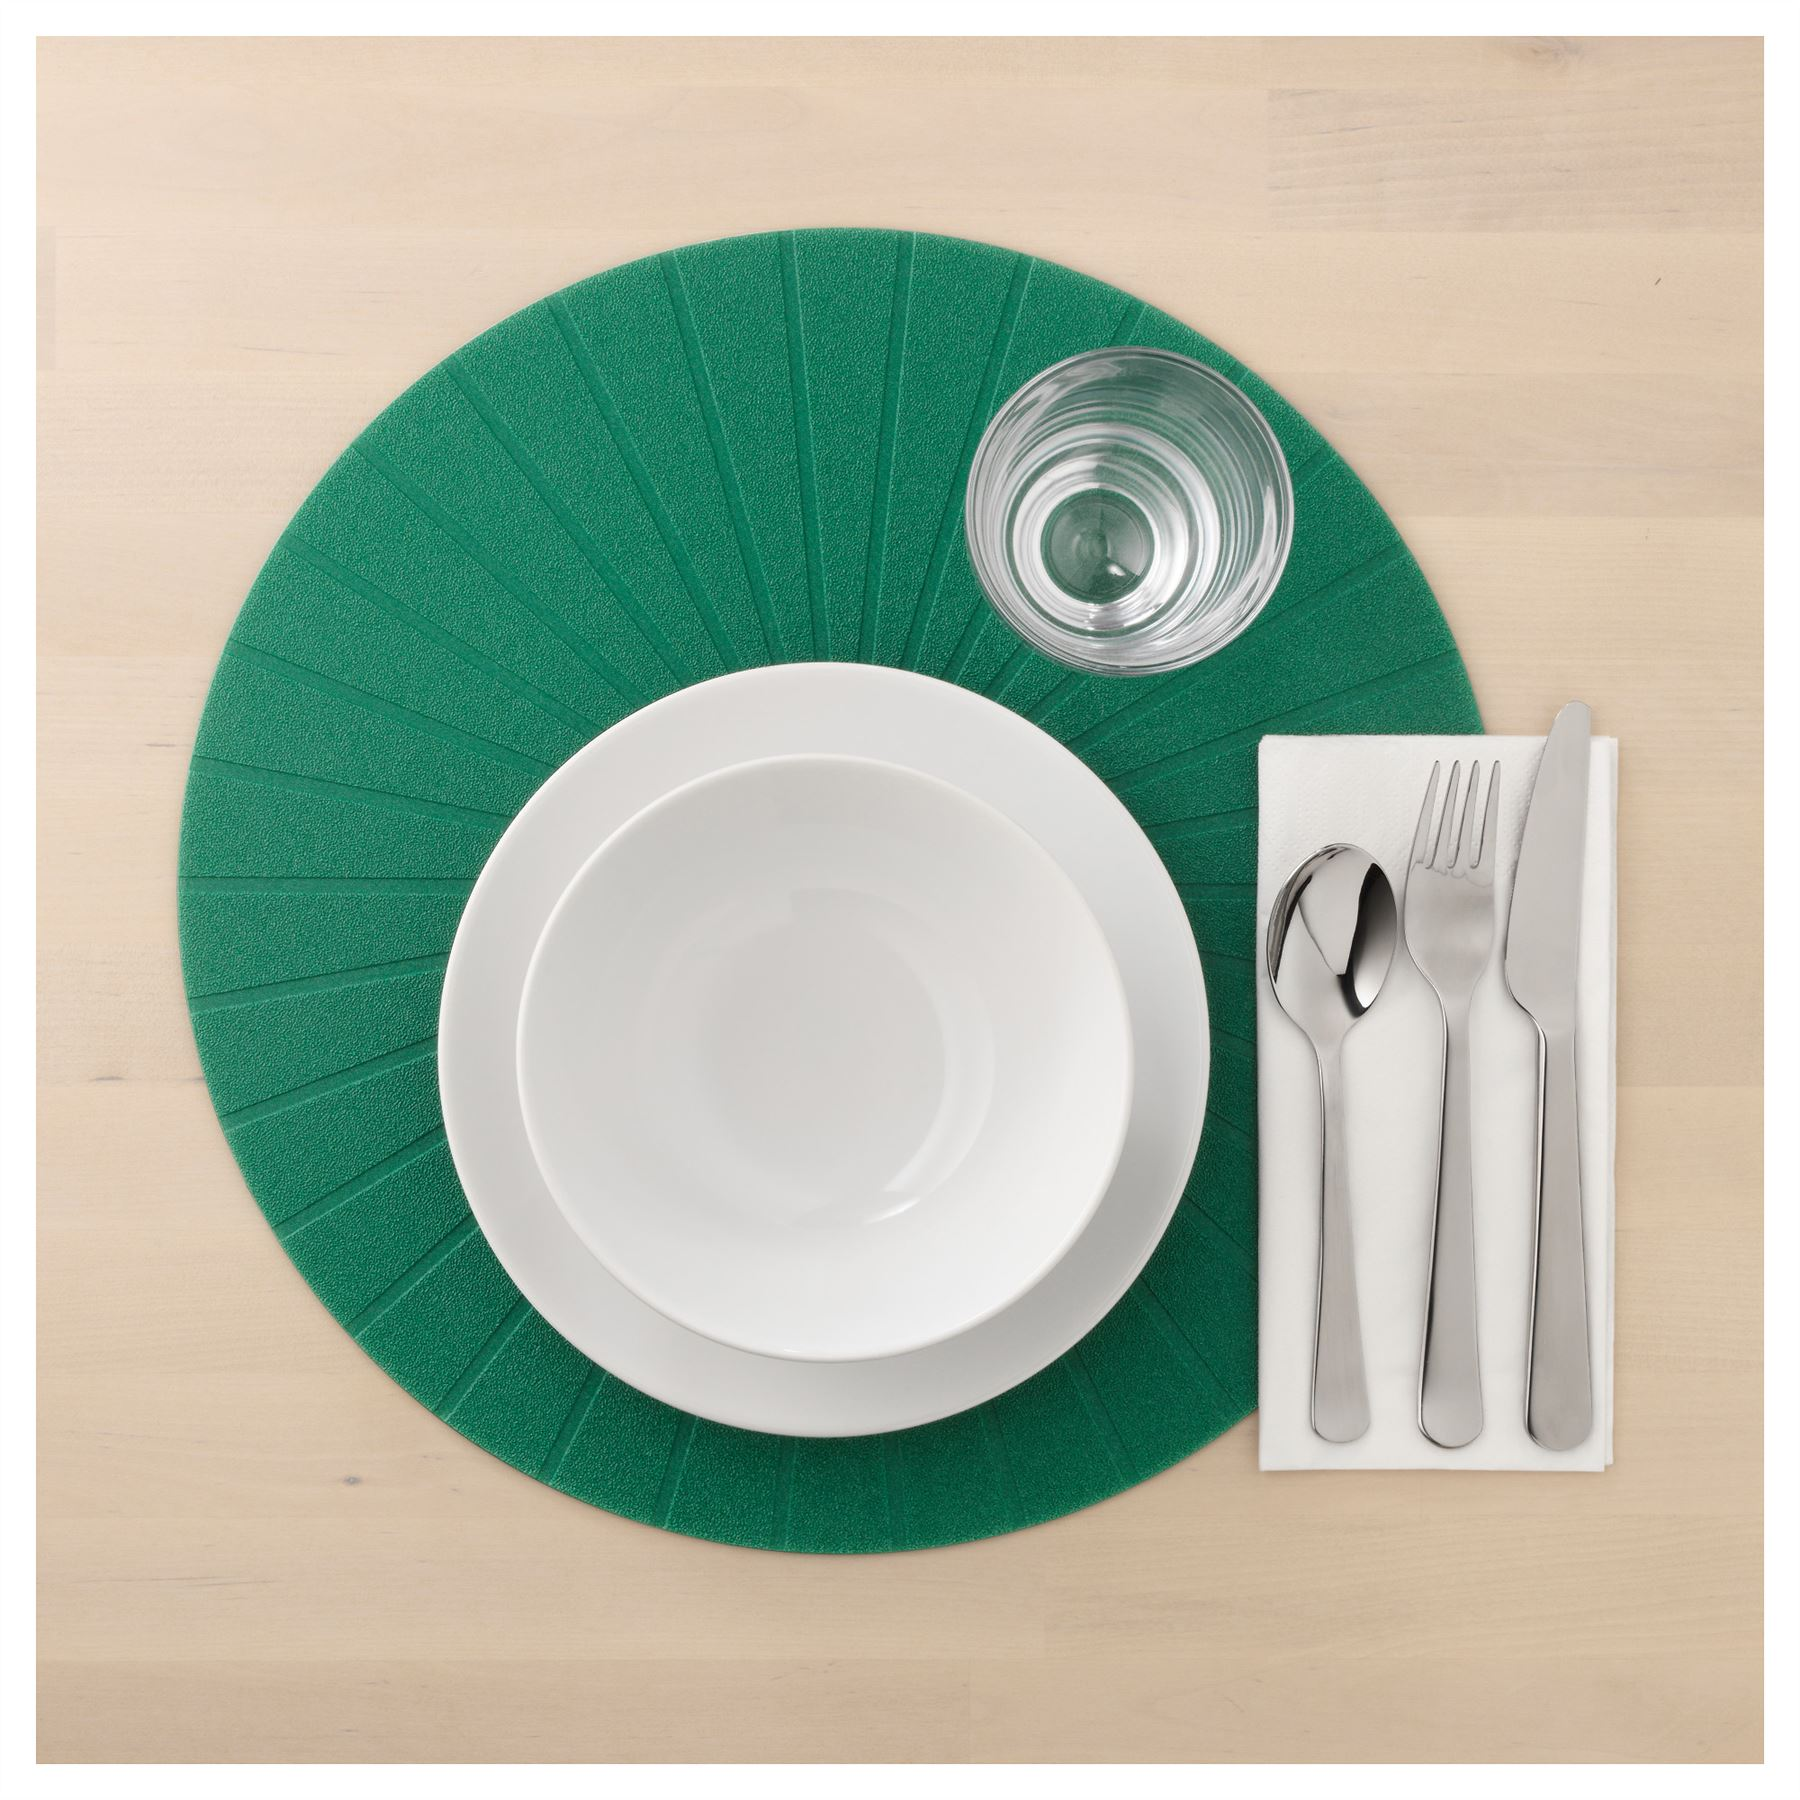 Ikea Panna Place Mat Dark Green 37cm Round Dining Table Kitchen Home ...